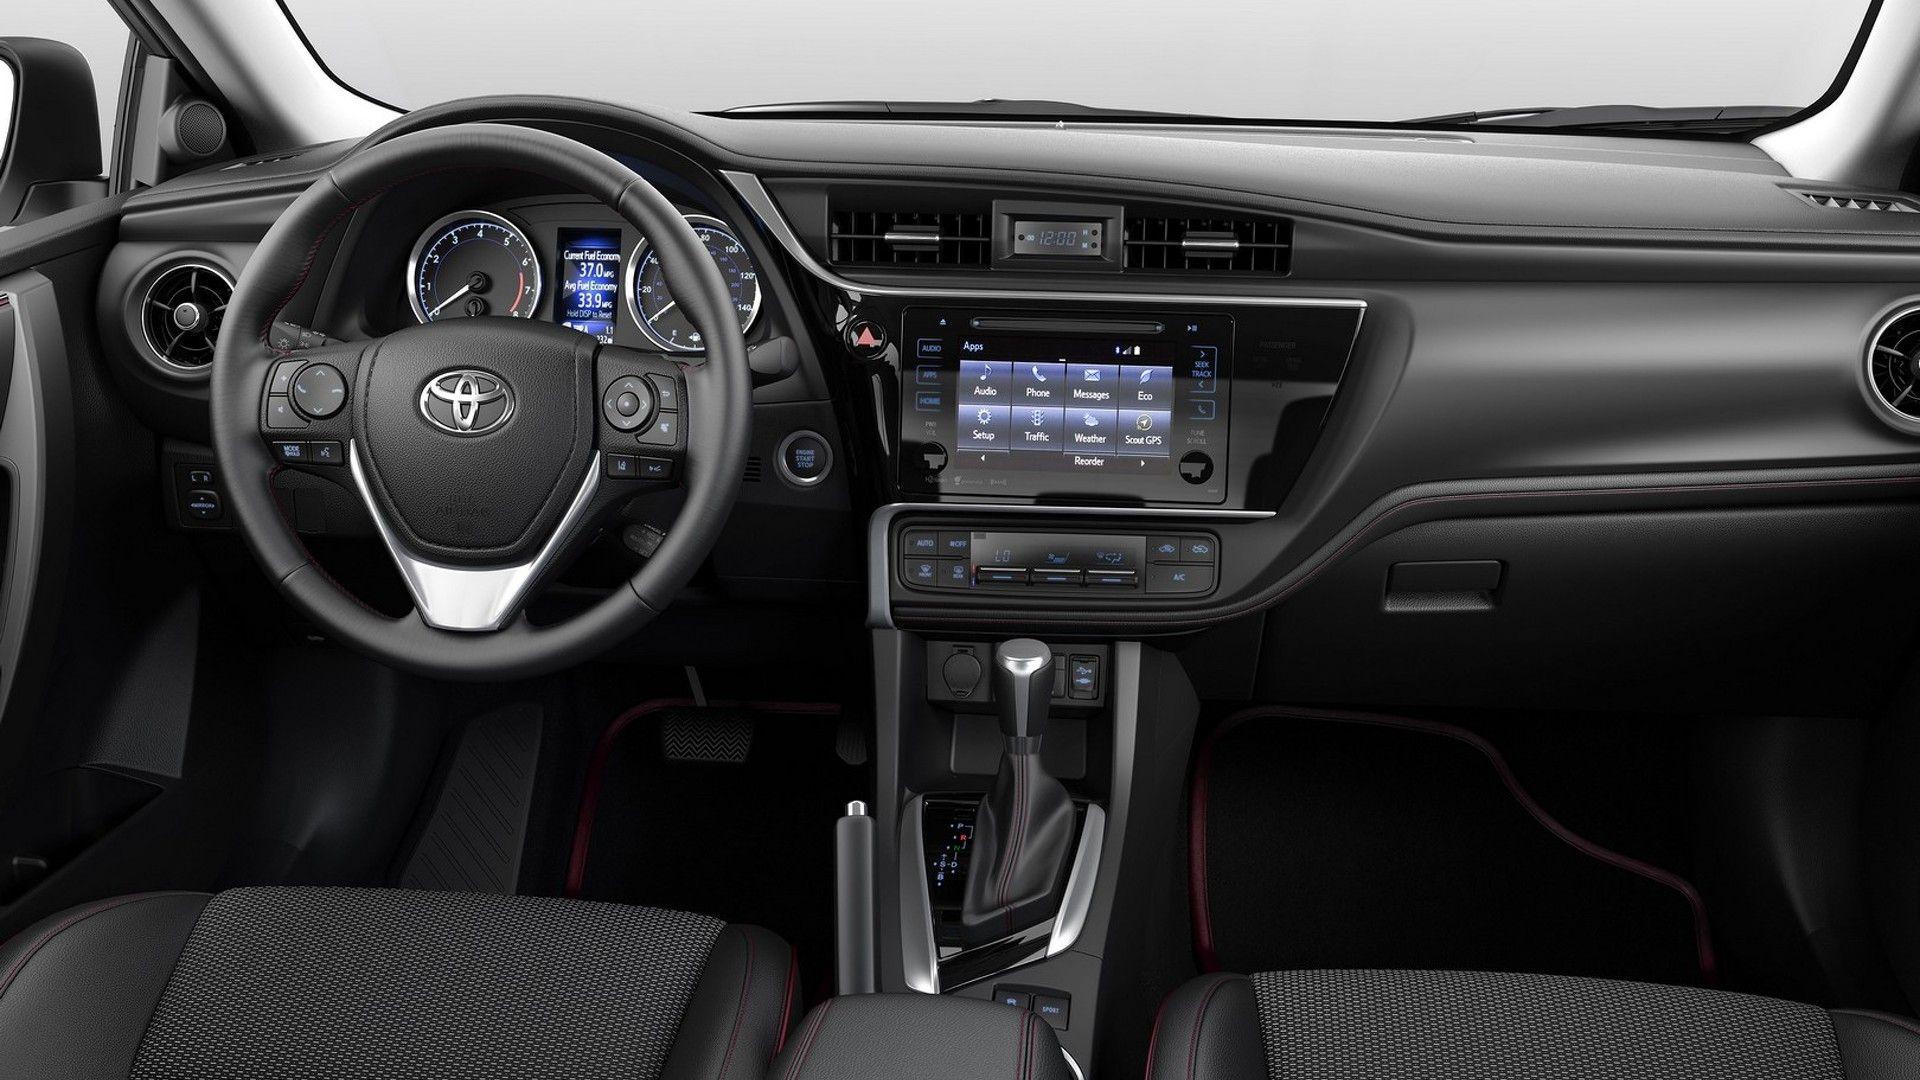 2017 Toyota Corolla 50th Anniversary Special Edition Jpg 1 920